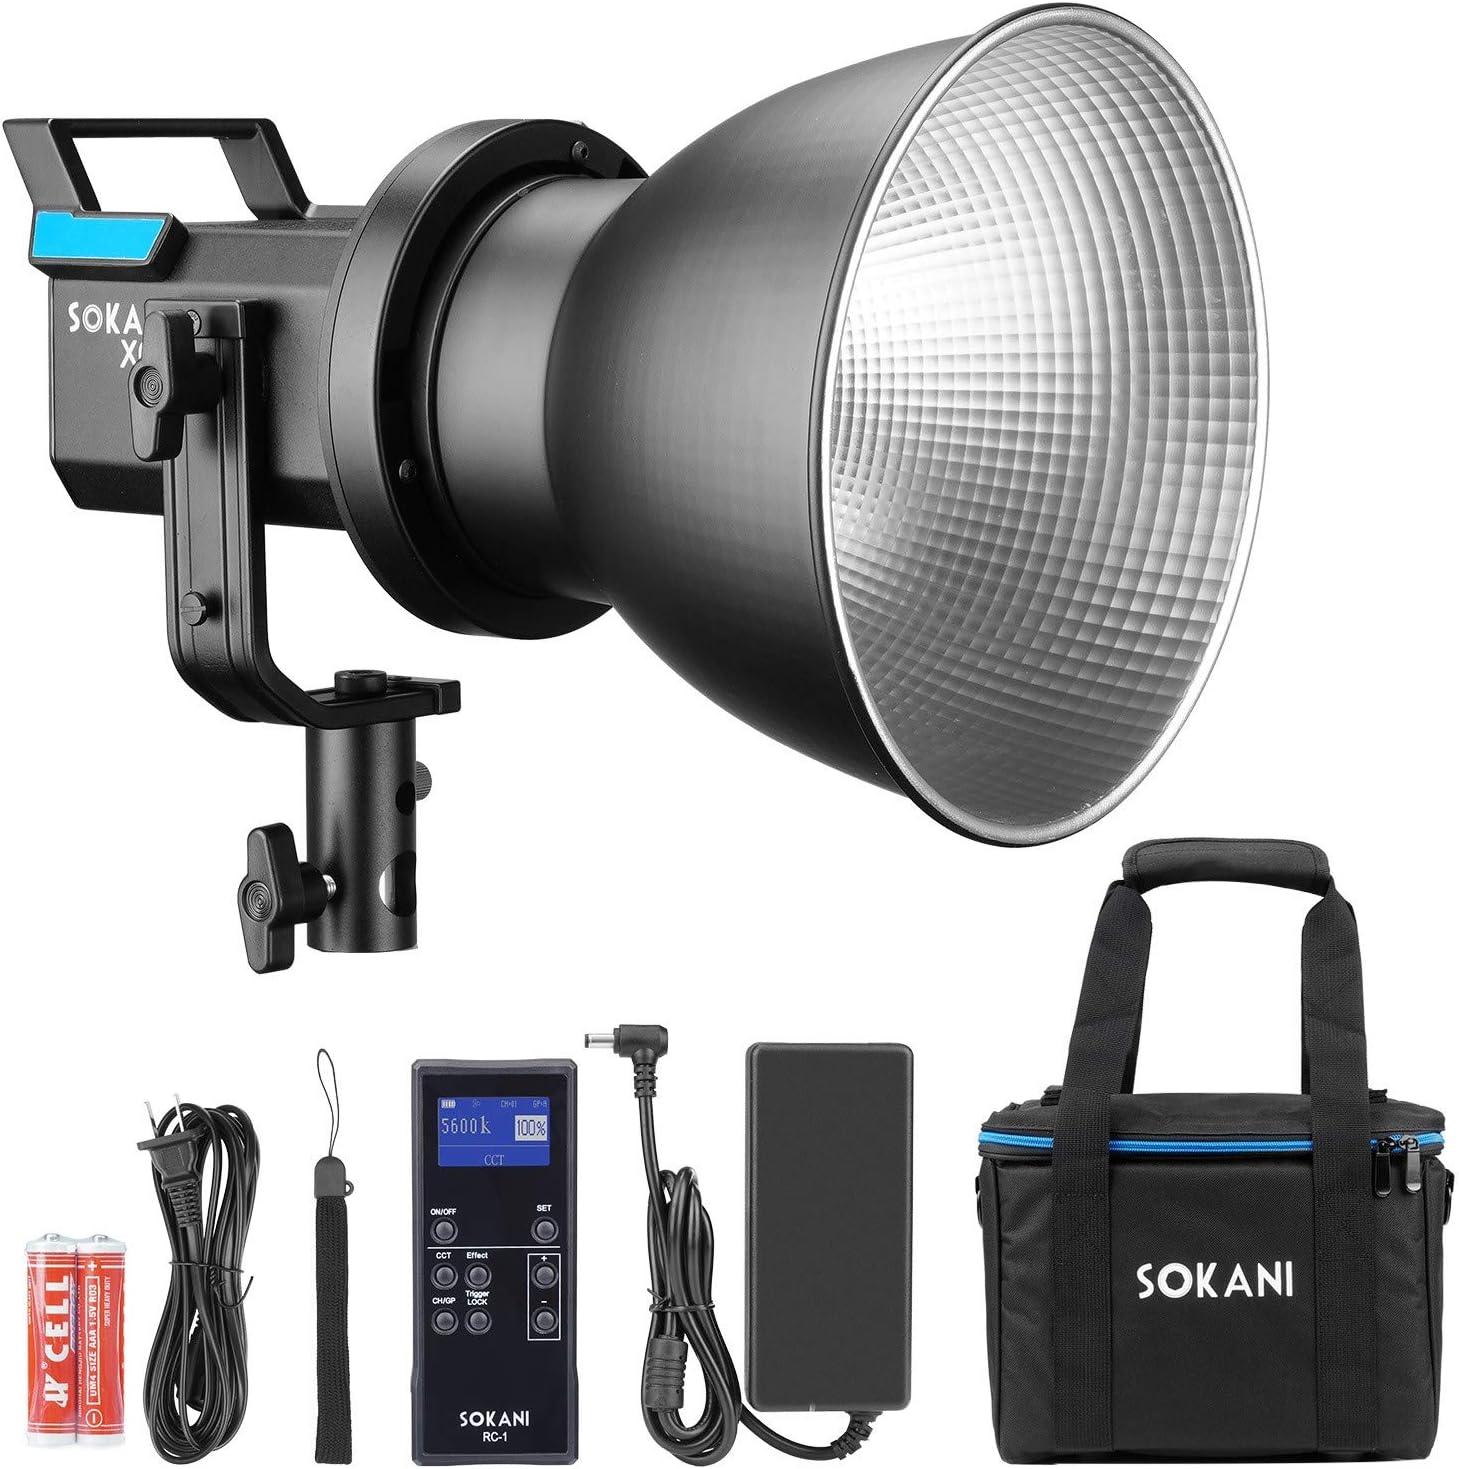 80W 5600K Daylight Balanced CRI96 Bowens Mount Sokani X60 with Bag Kit COB LED Video Light 5 Pre-Programmed Lighting Effect Wirelessly Adjust Brightness TLCI 95